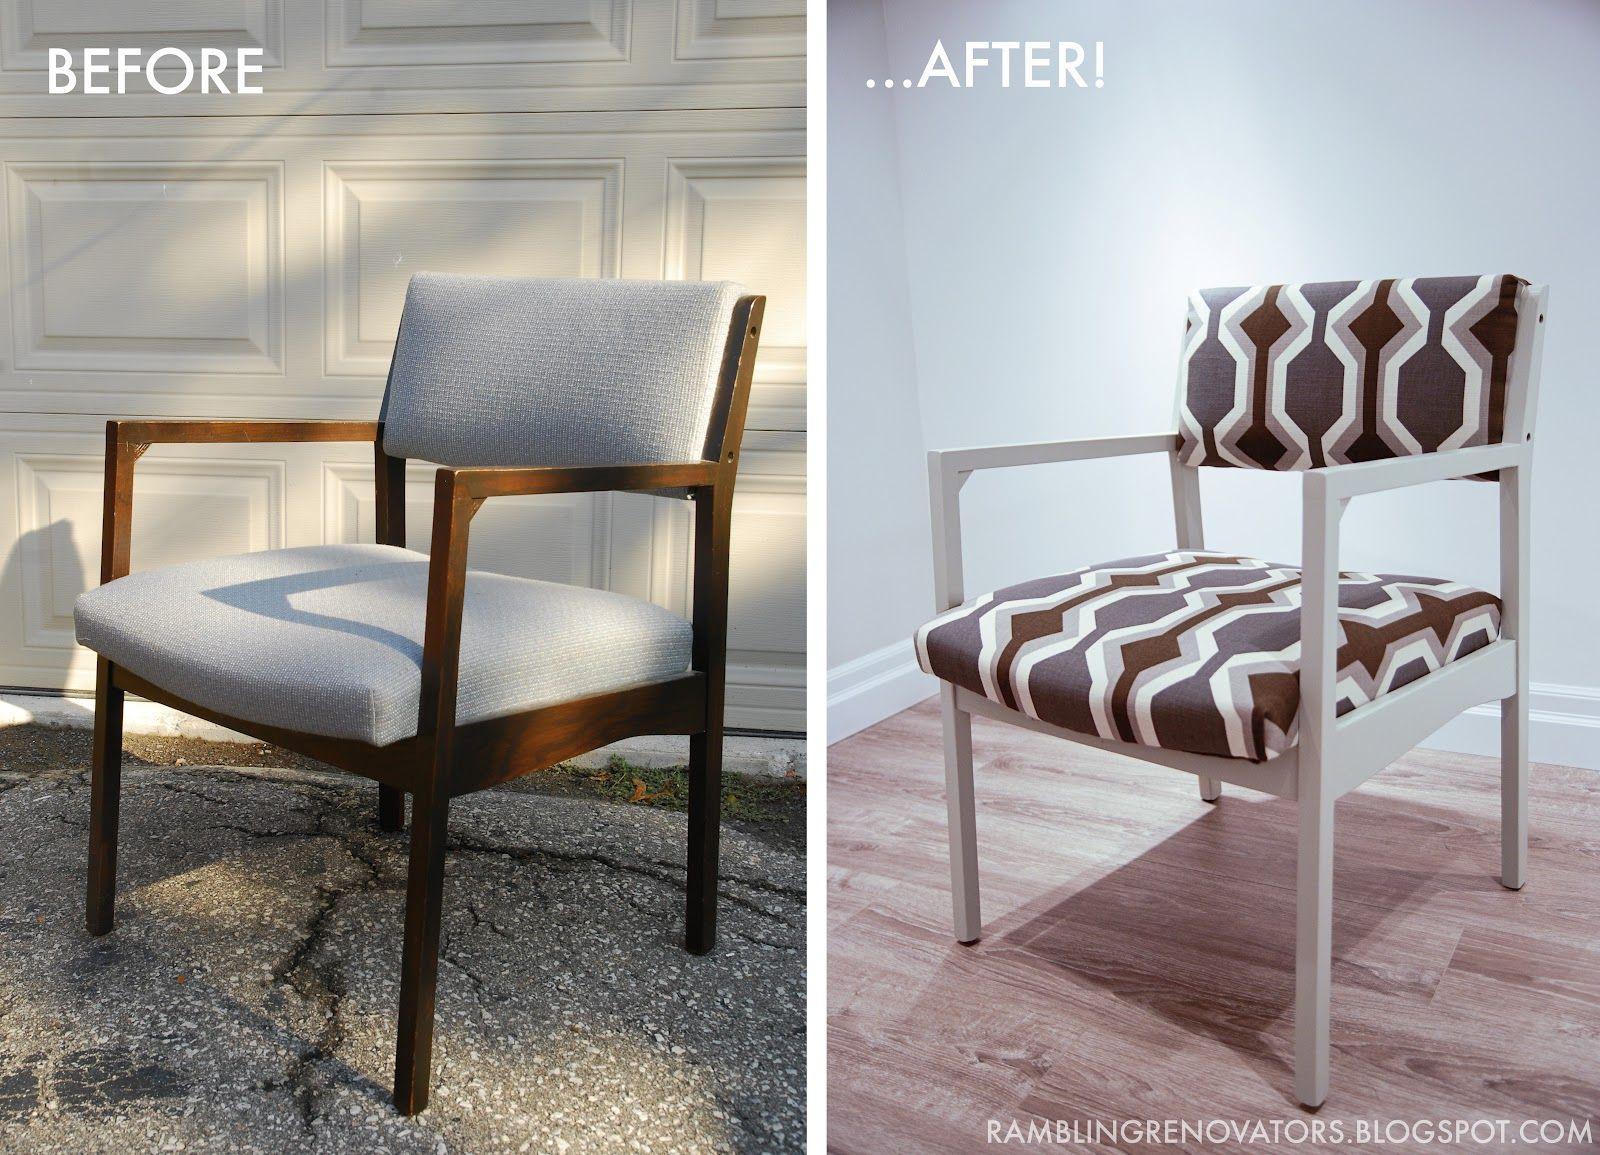 Rambling Renovators Diy Retro Chair Makeover I Think